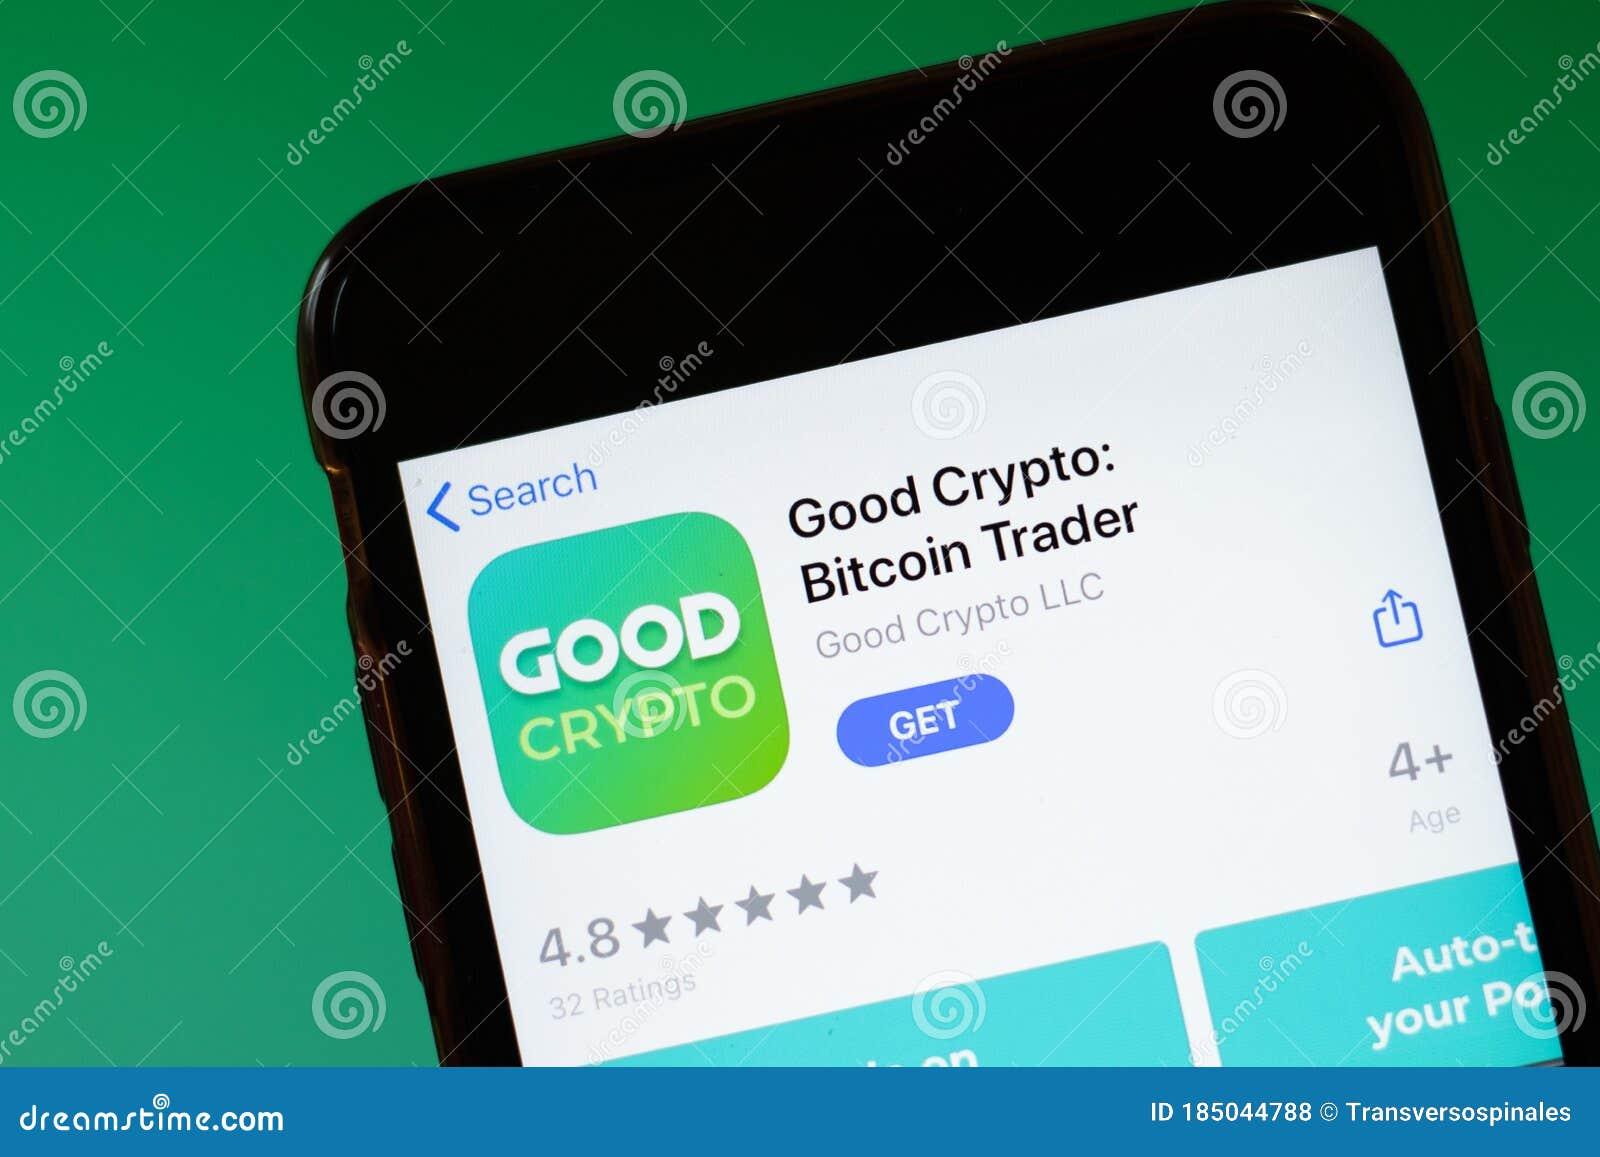 licensed bitcoin trader)